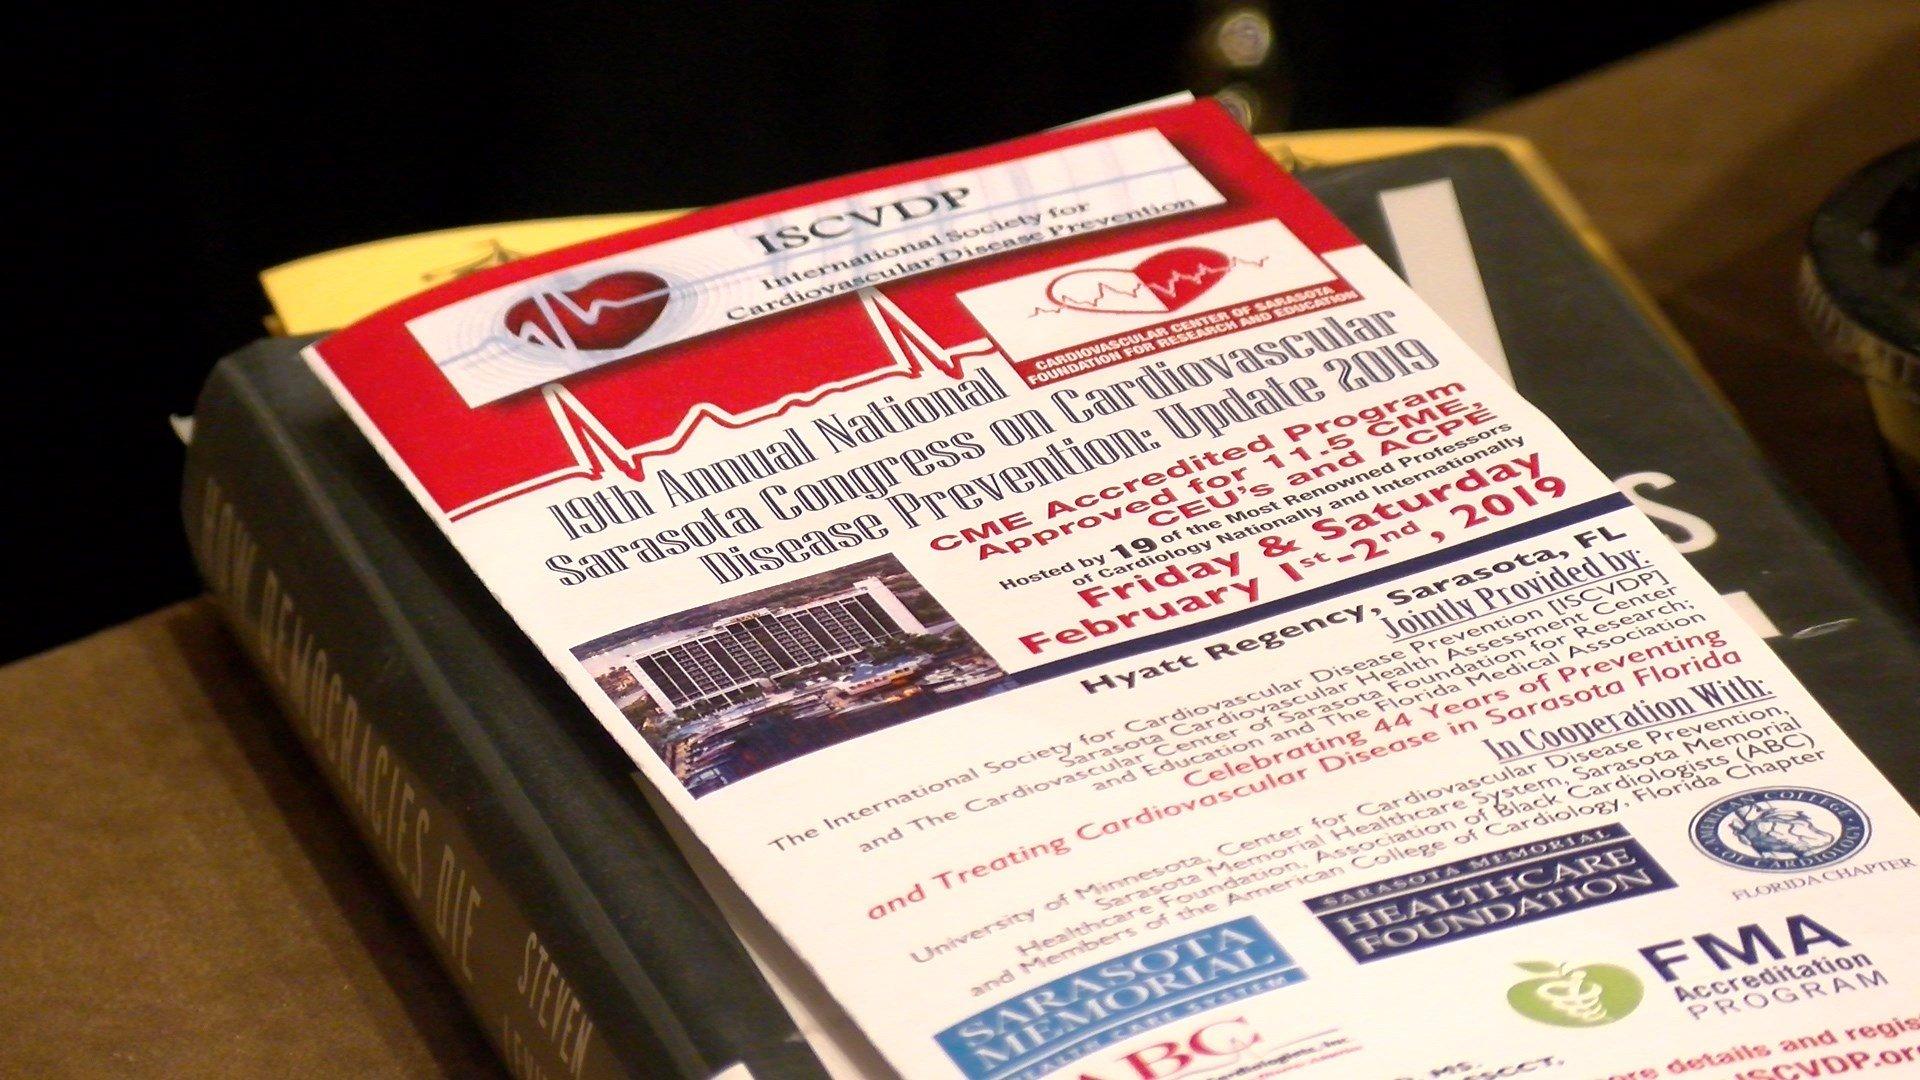 Annual cardiovascular congress tackles heart disease